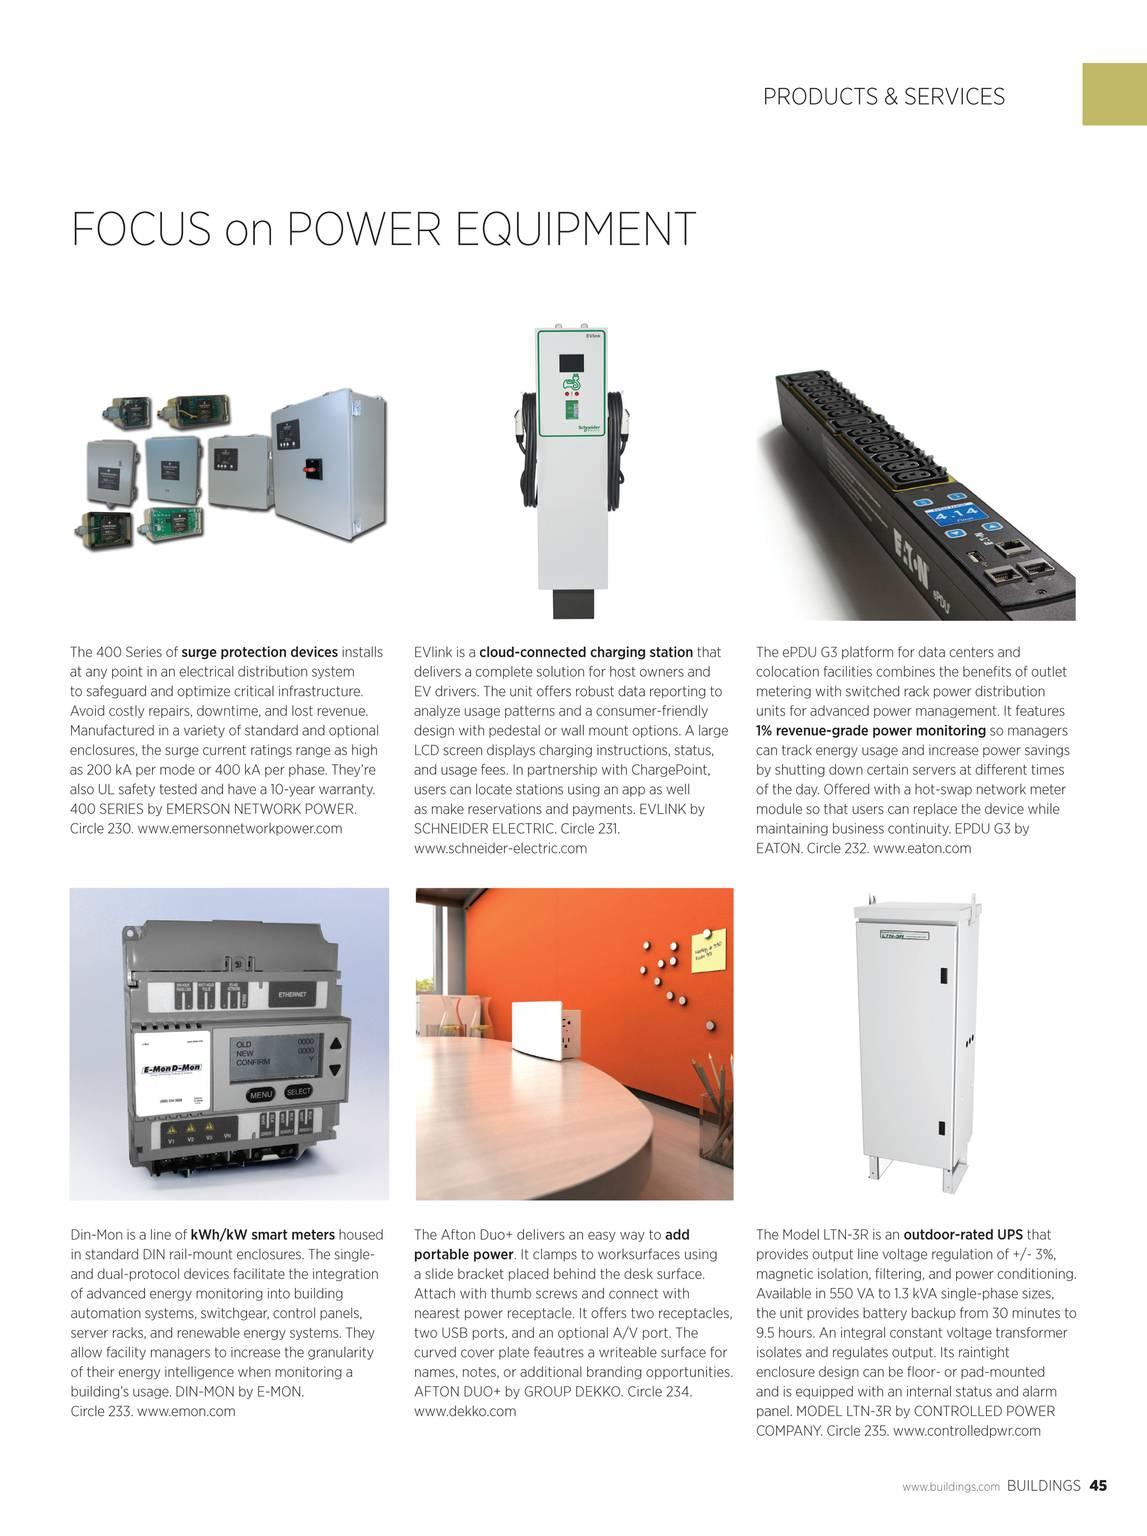 Buildings Magazine - Buildings 12/2014 - page 45